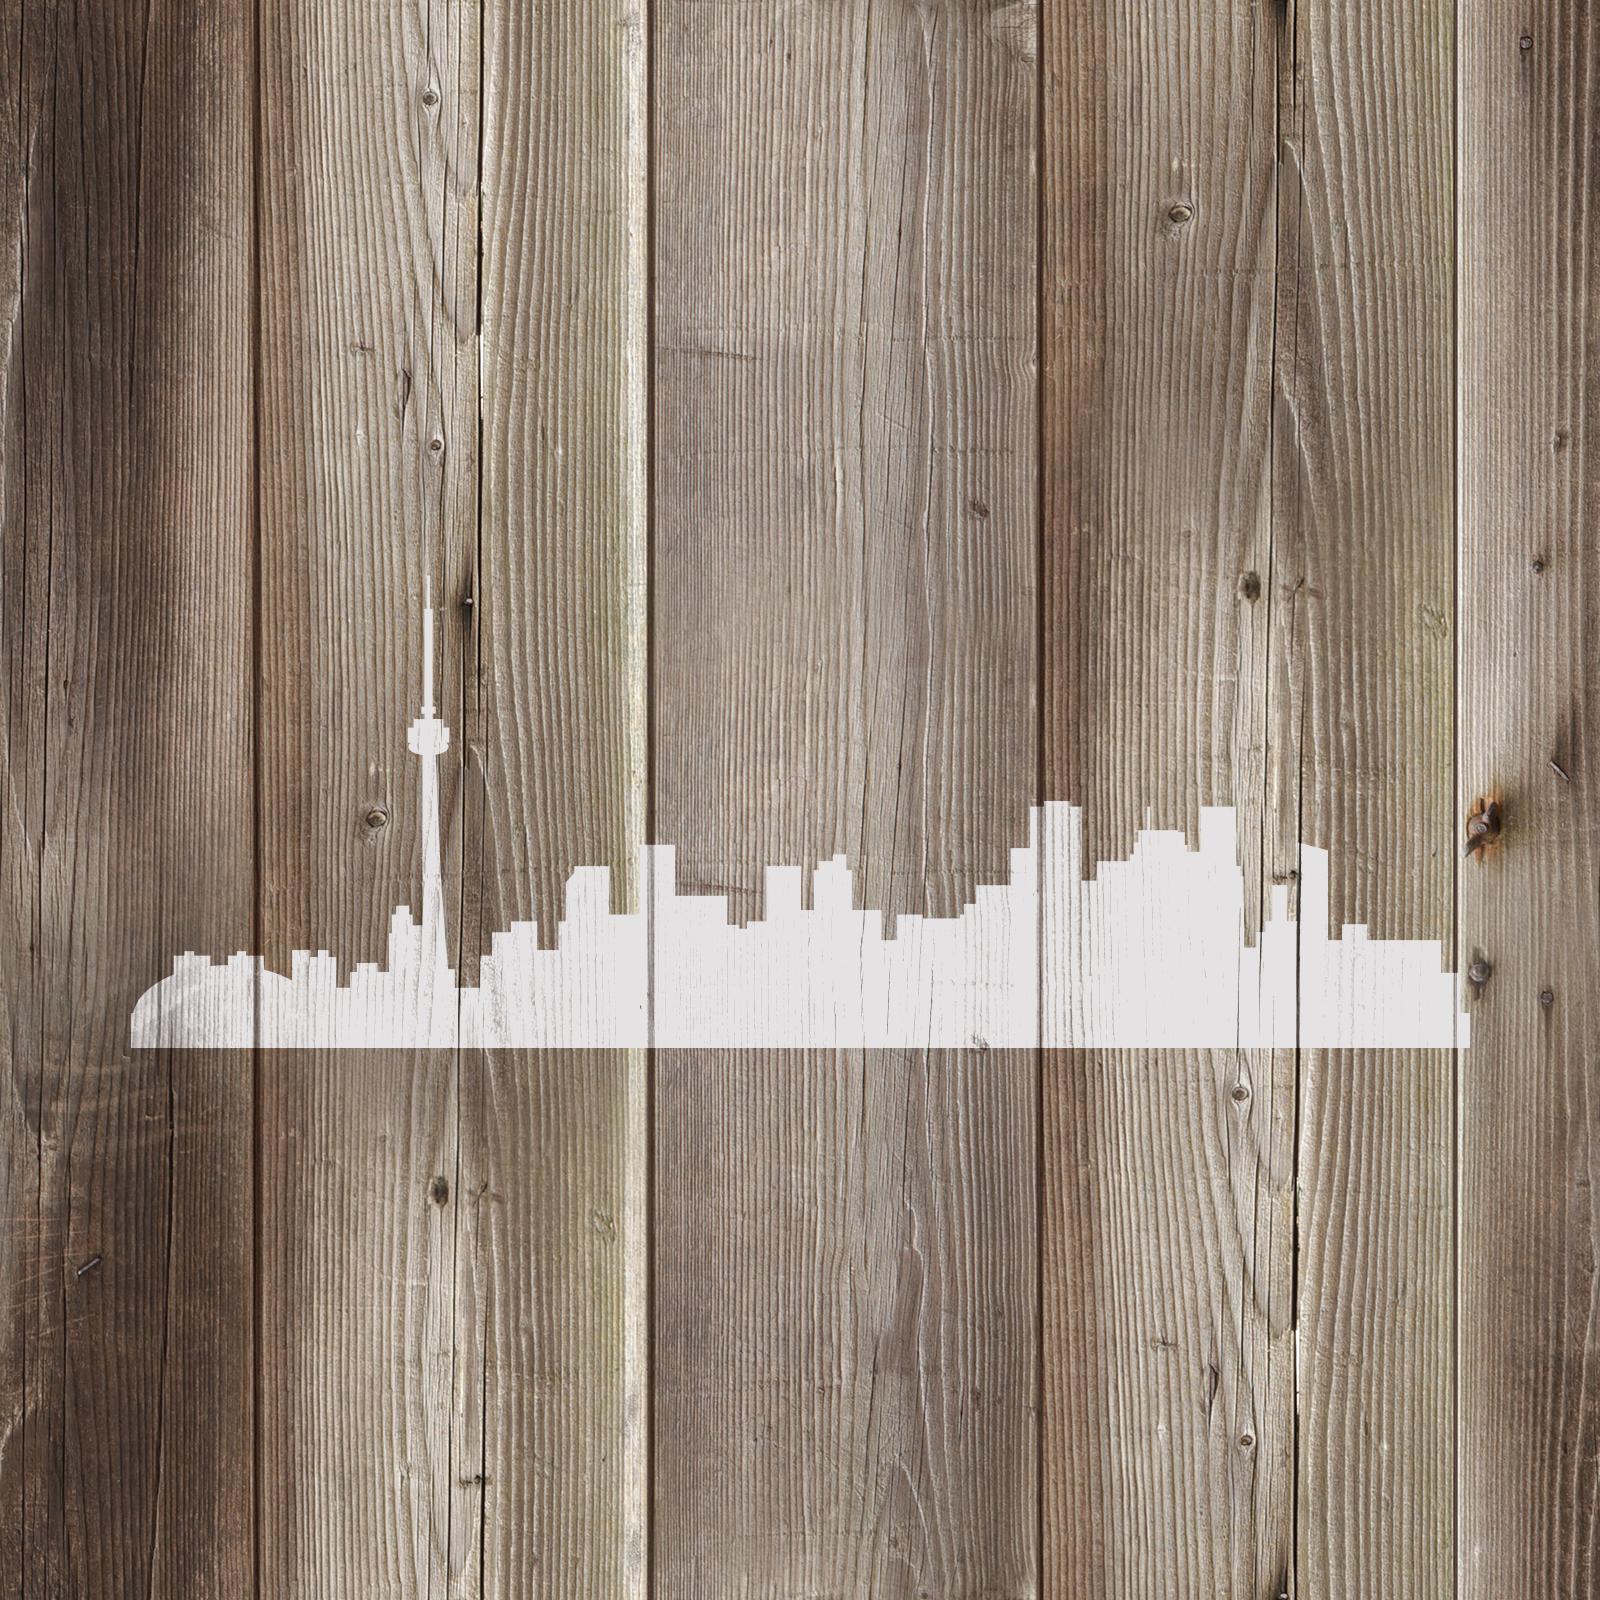 Toronto Skyline Stencil - Durable & Reusable Mylar Stencils